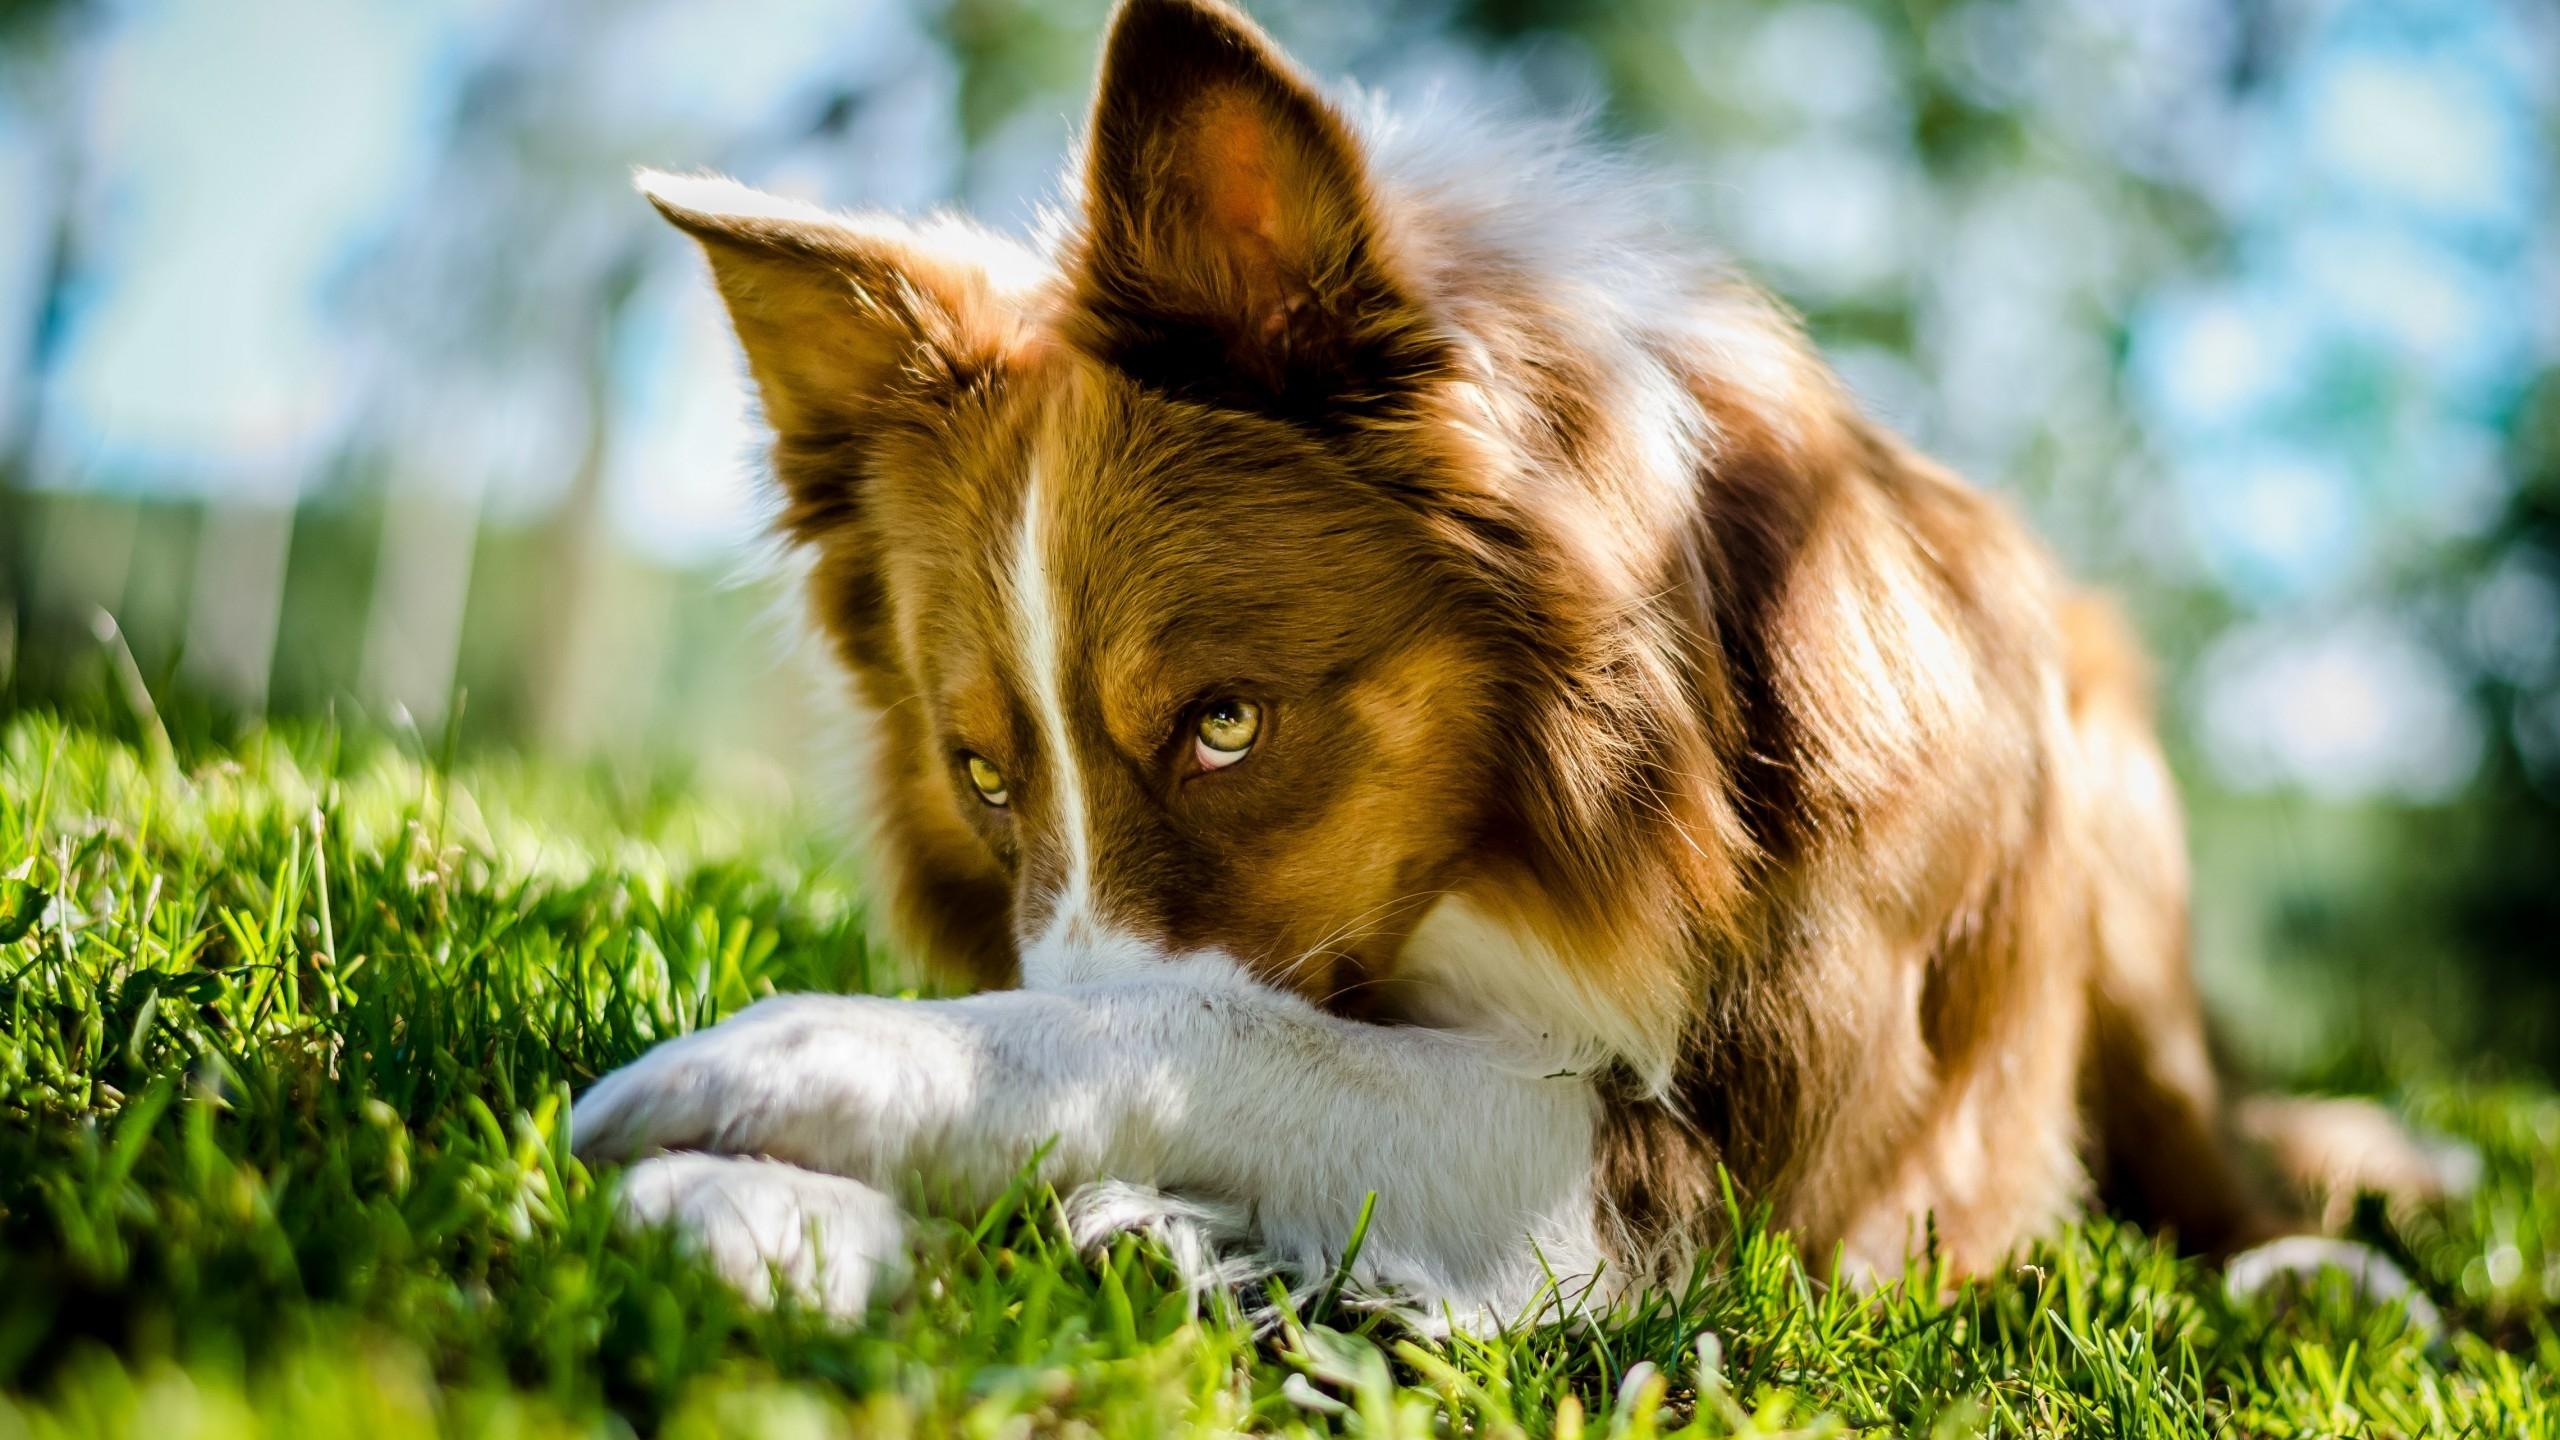 2560x1440 Beautiful Collie Dog desktop PC and Mac wallpaper 2560x1440